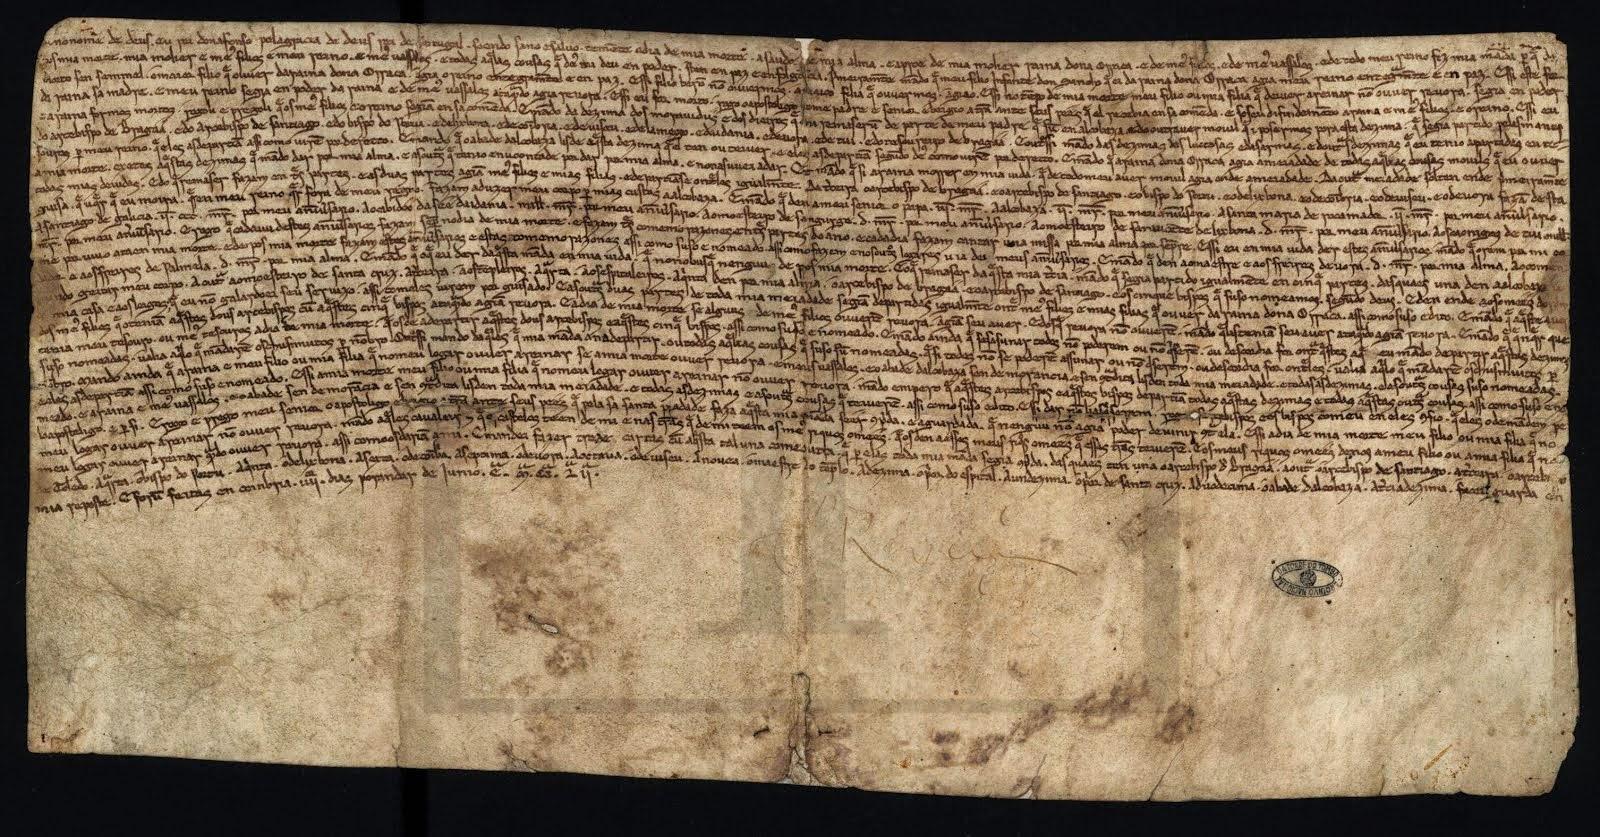 27 de Junho 2014: Língua Portuguesa fez 800 anos